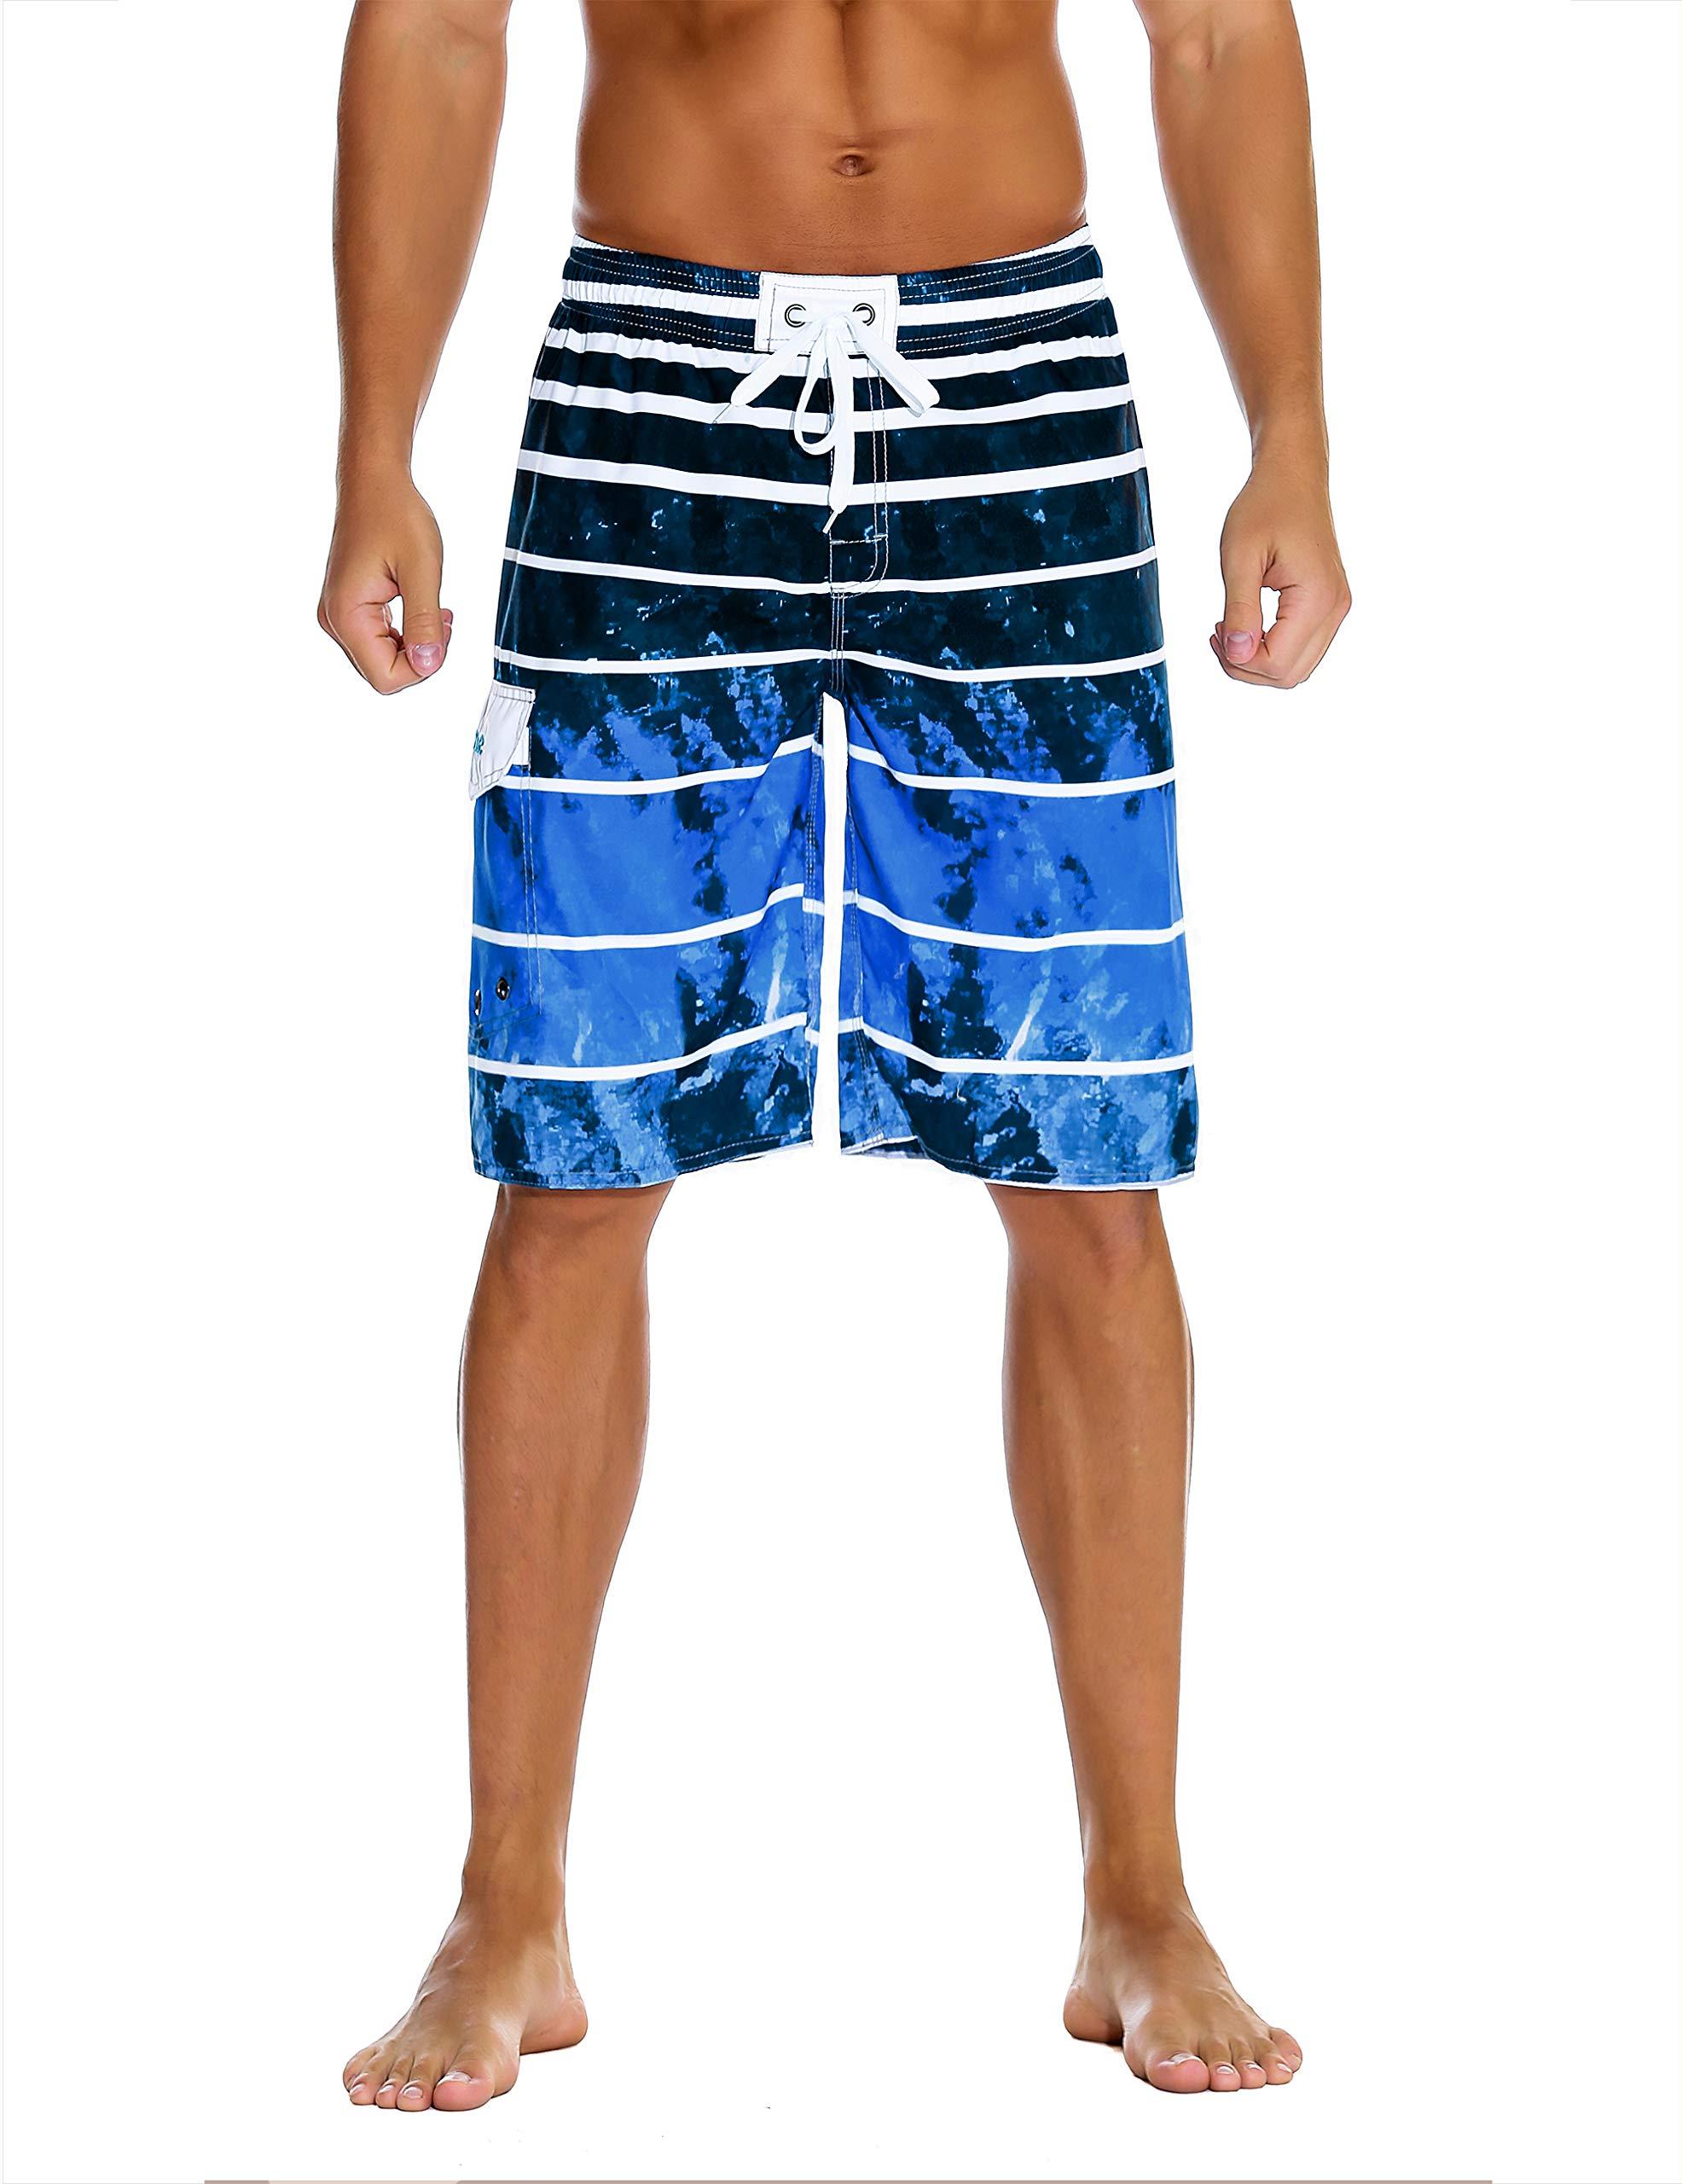 Nonwe Men's Beachwear Quick Dry Holiday Drawstring